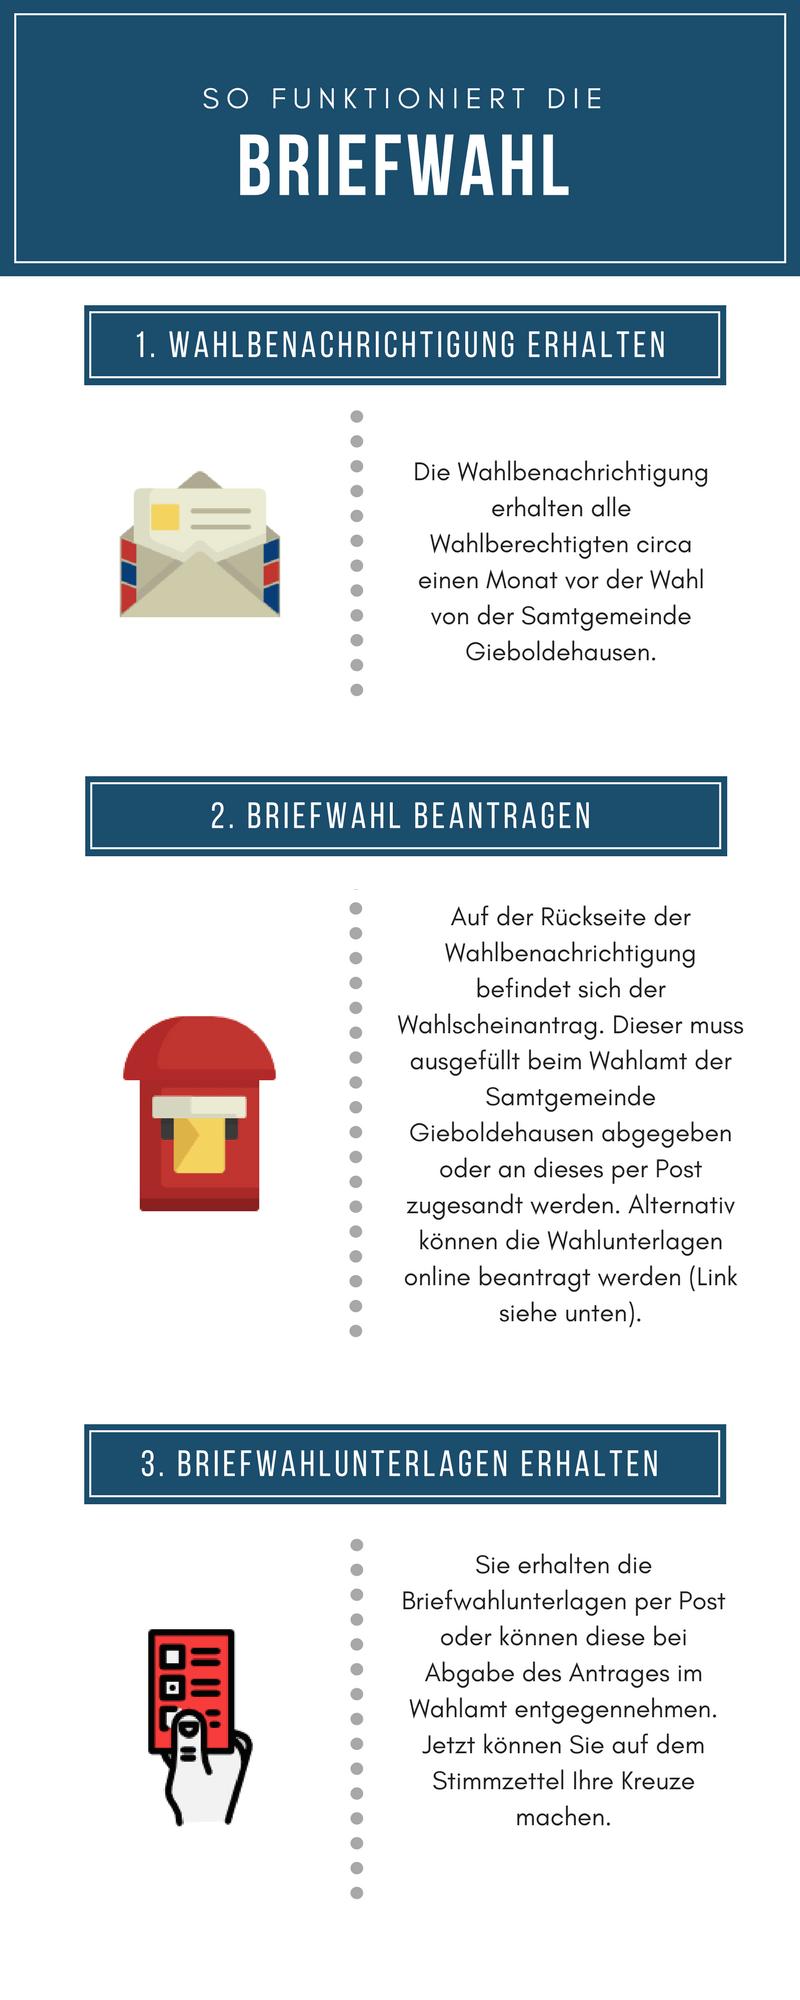 Wie funktioniert die Briefwahl 1